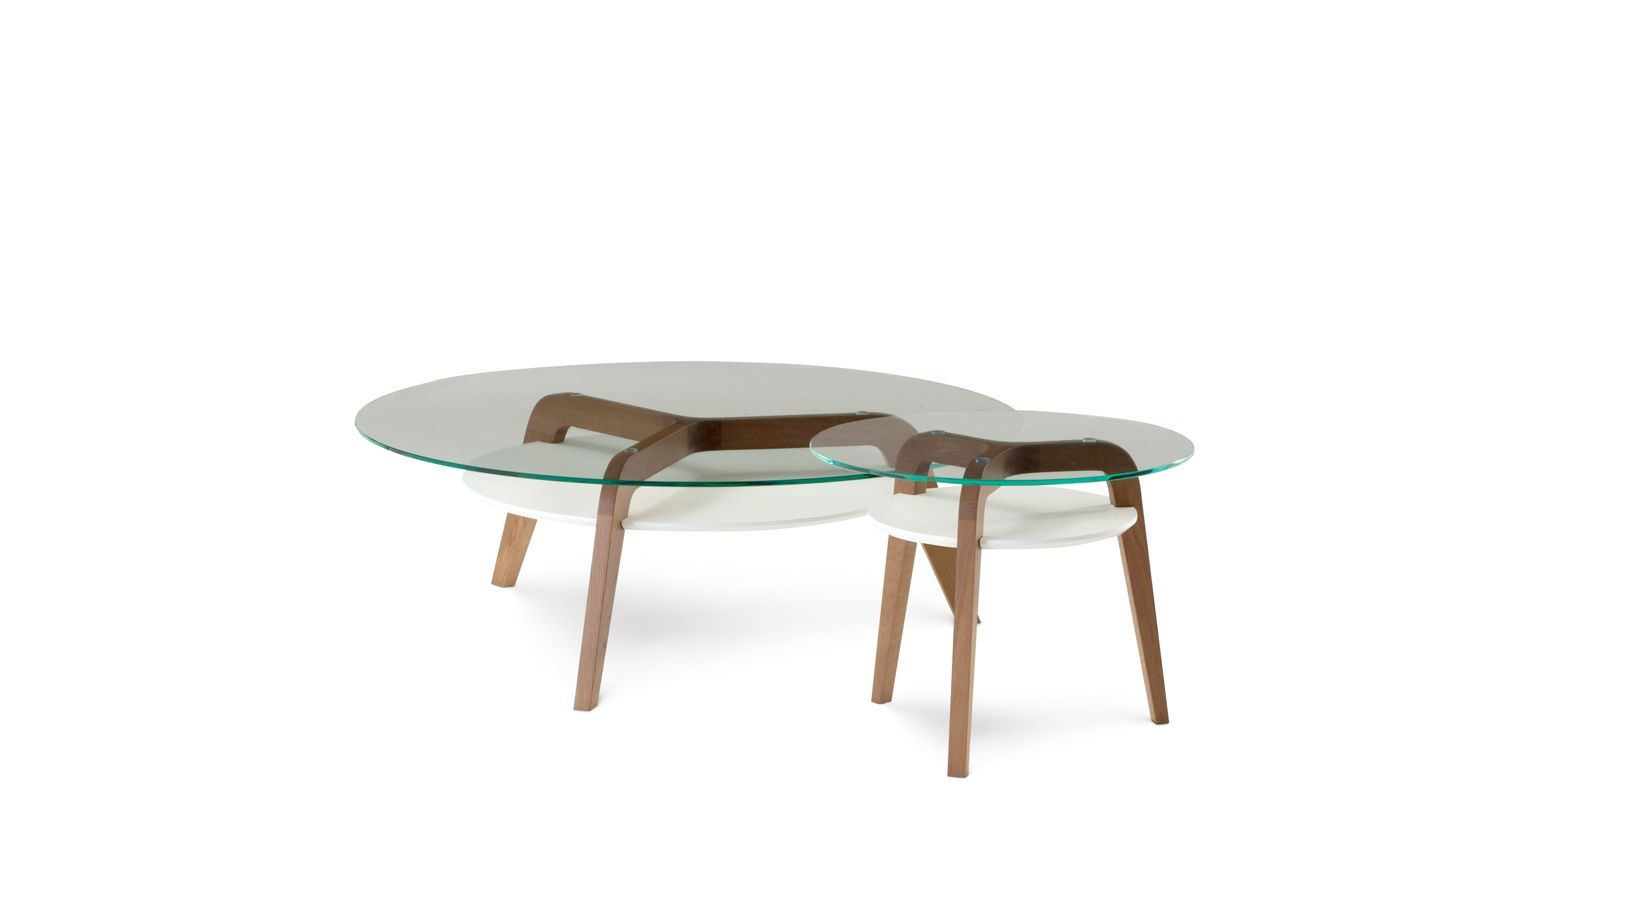 Flying Glass Table Basse Tables Basses Roche Bobois Table En Verre Tables De Cocktail Table Basse